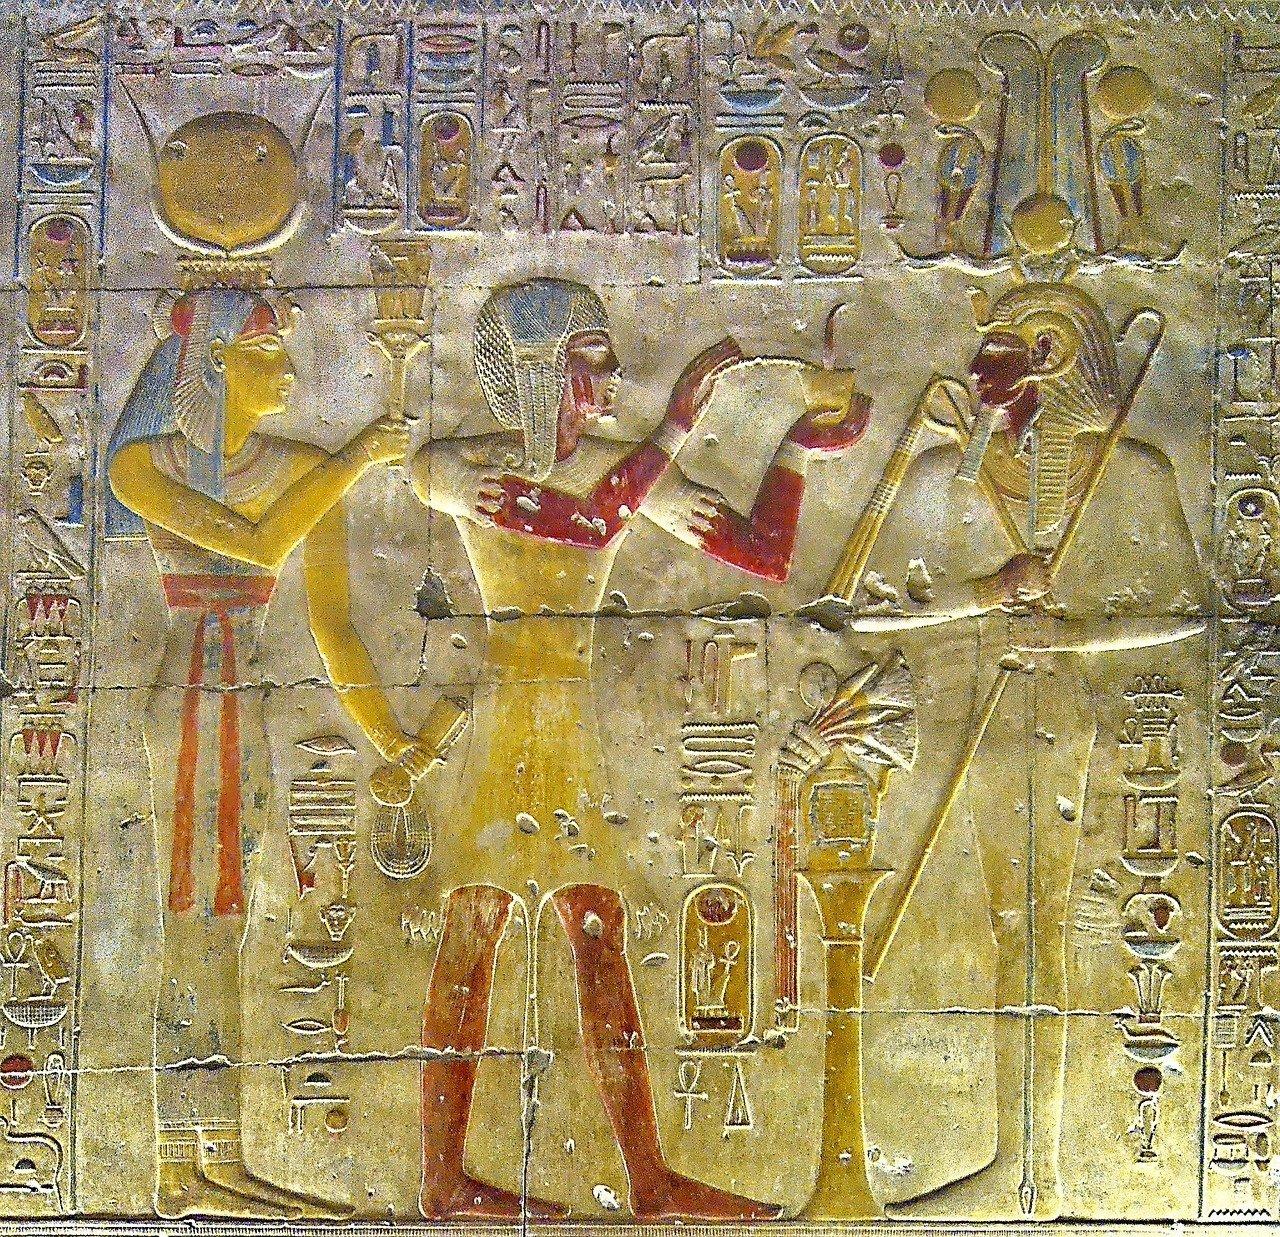 egypt - Abydos